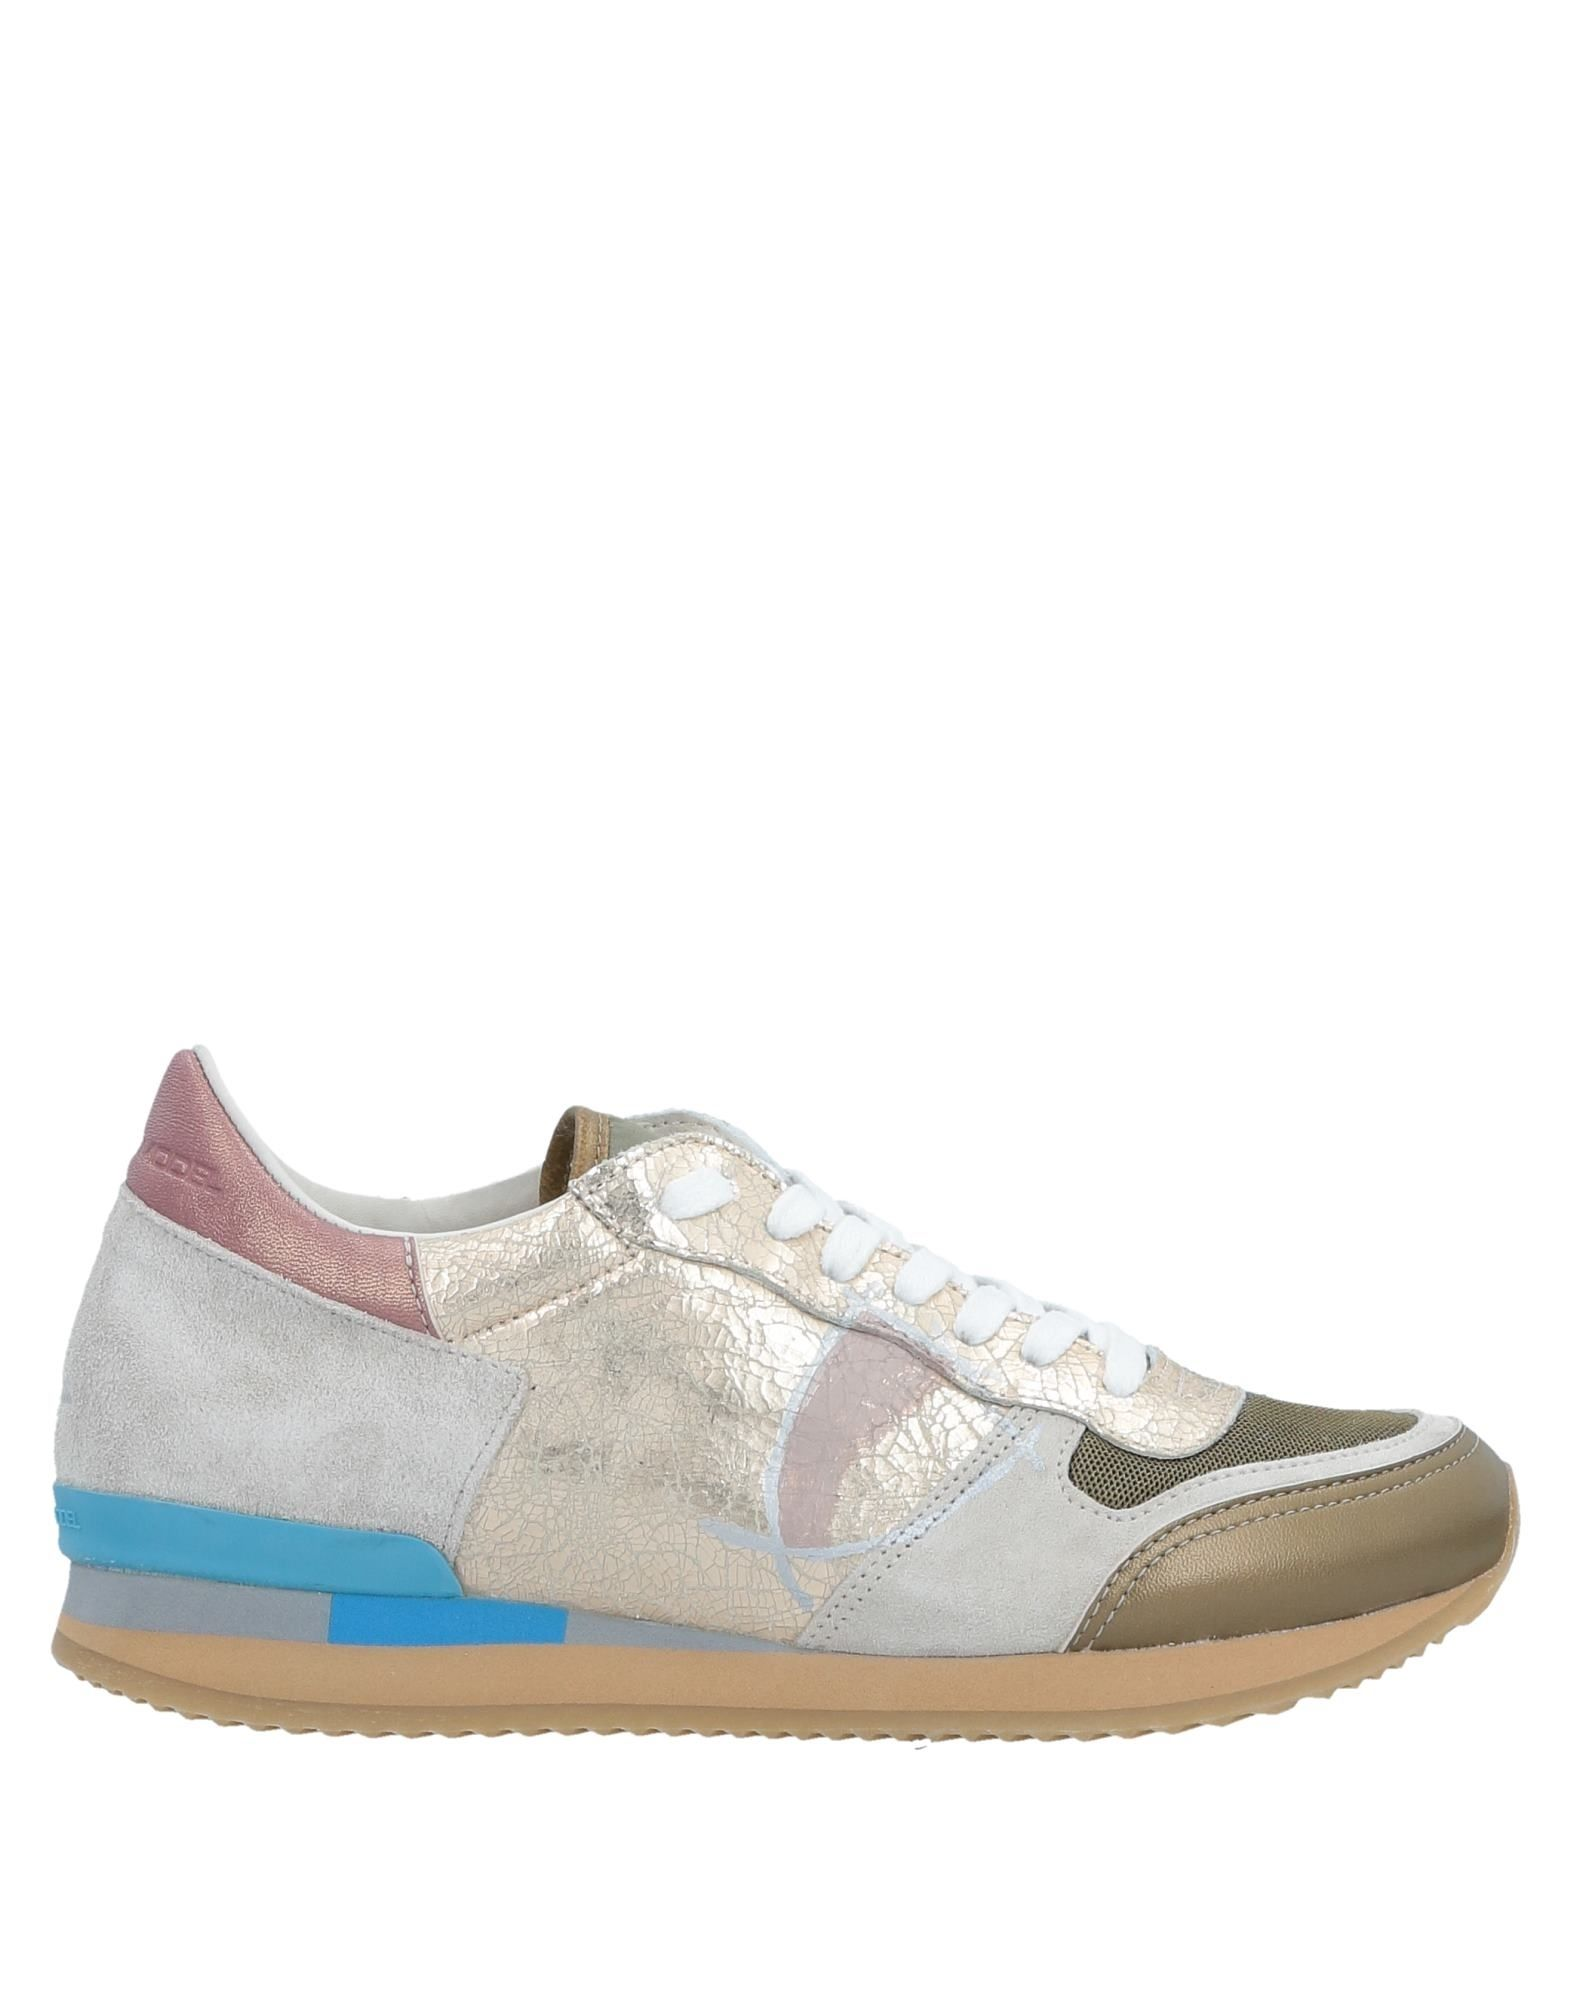 Moda Sneakers Hogan Donna Donna Hogan - 11516738PE 49fae4